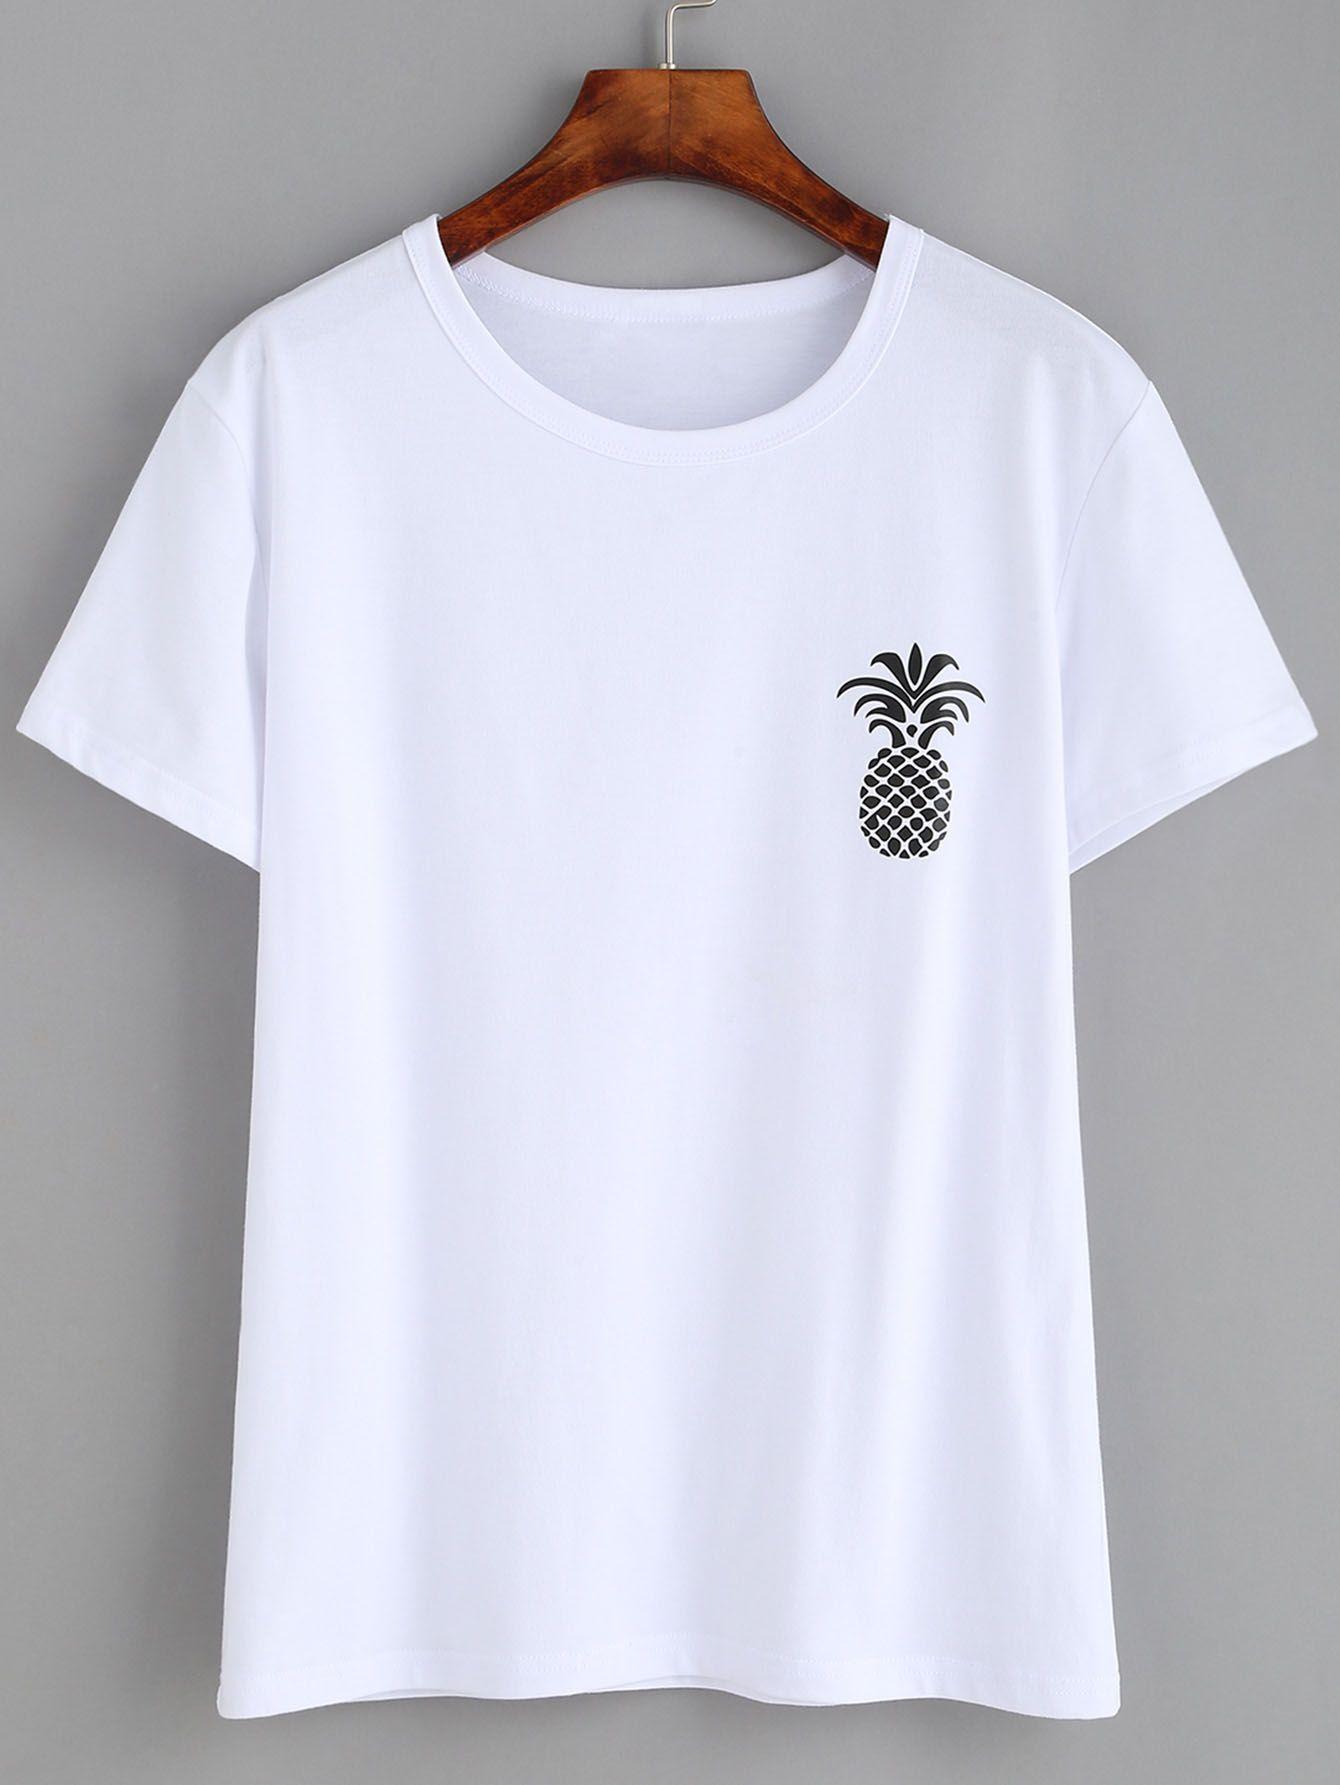 White Camiseta Camiseta Tee Pinapple Estampada Pinapple Tee 7FnwpqSPq